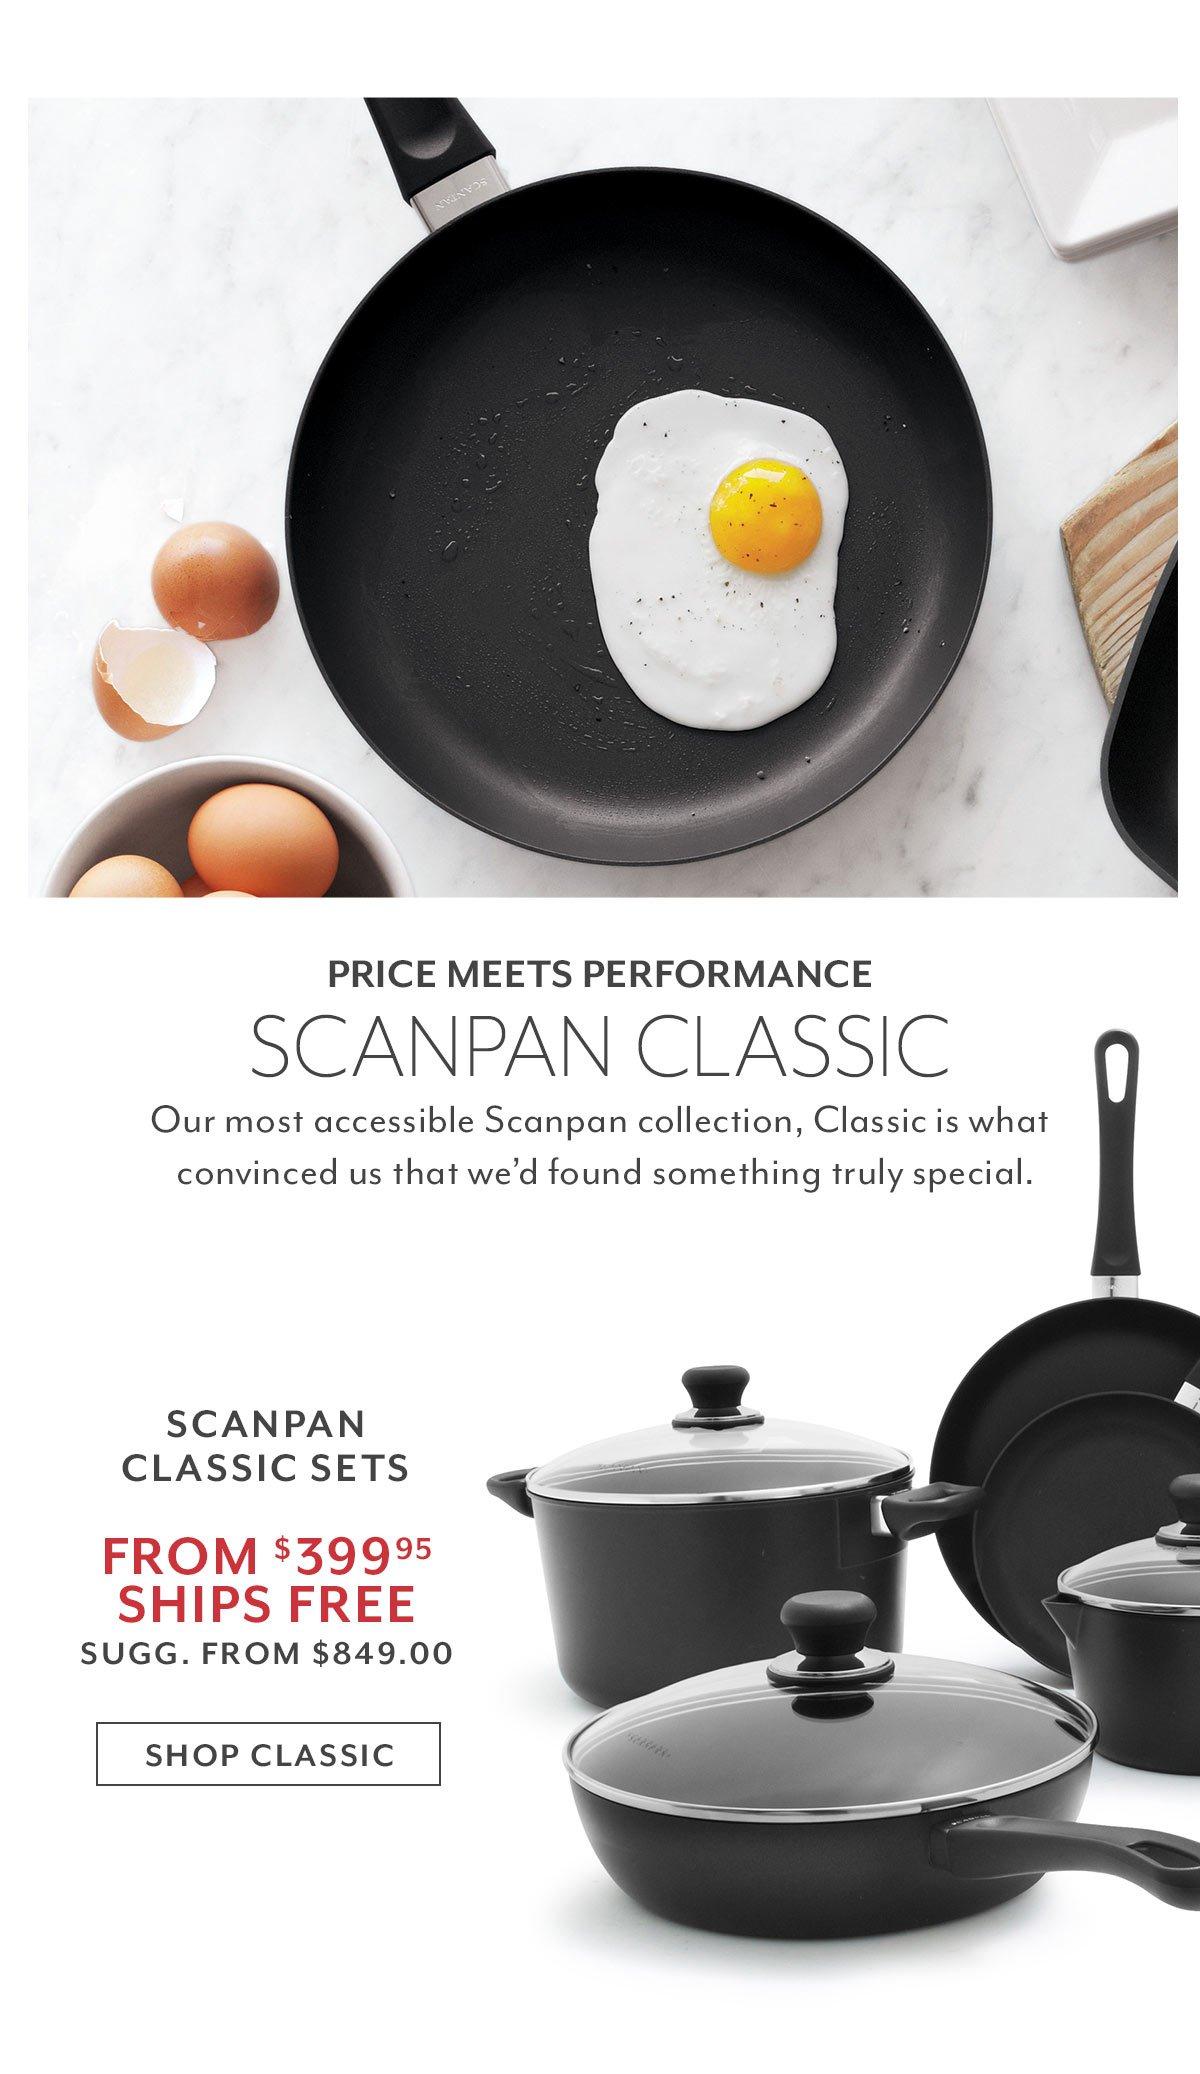 Scanpan Classic